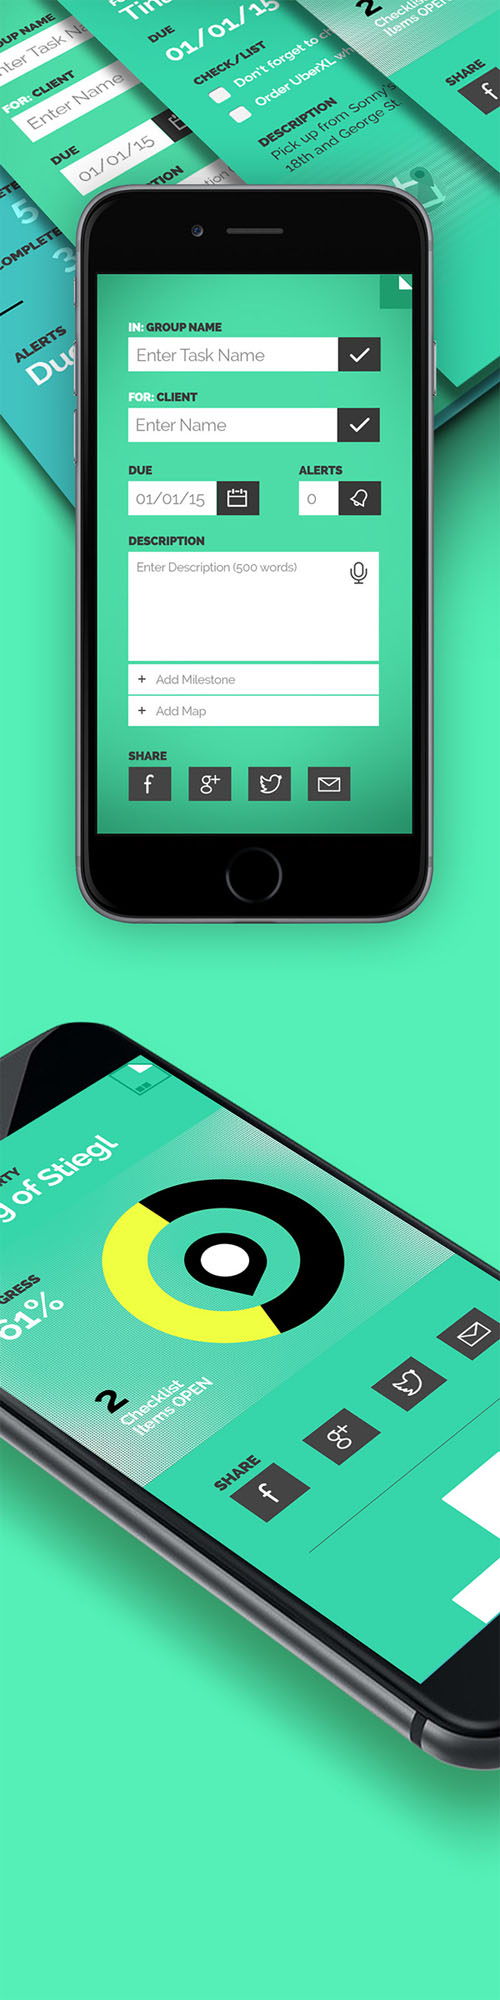 DoneList - To Do List App Concept